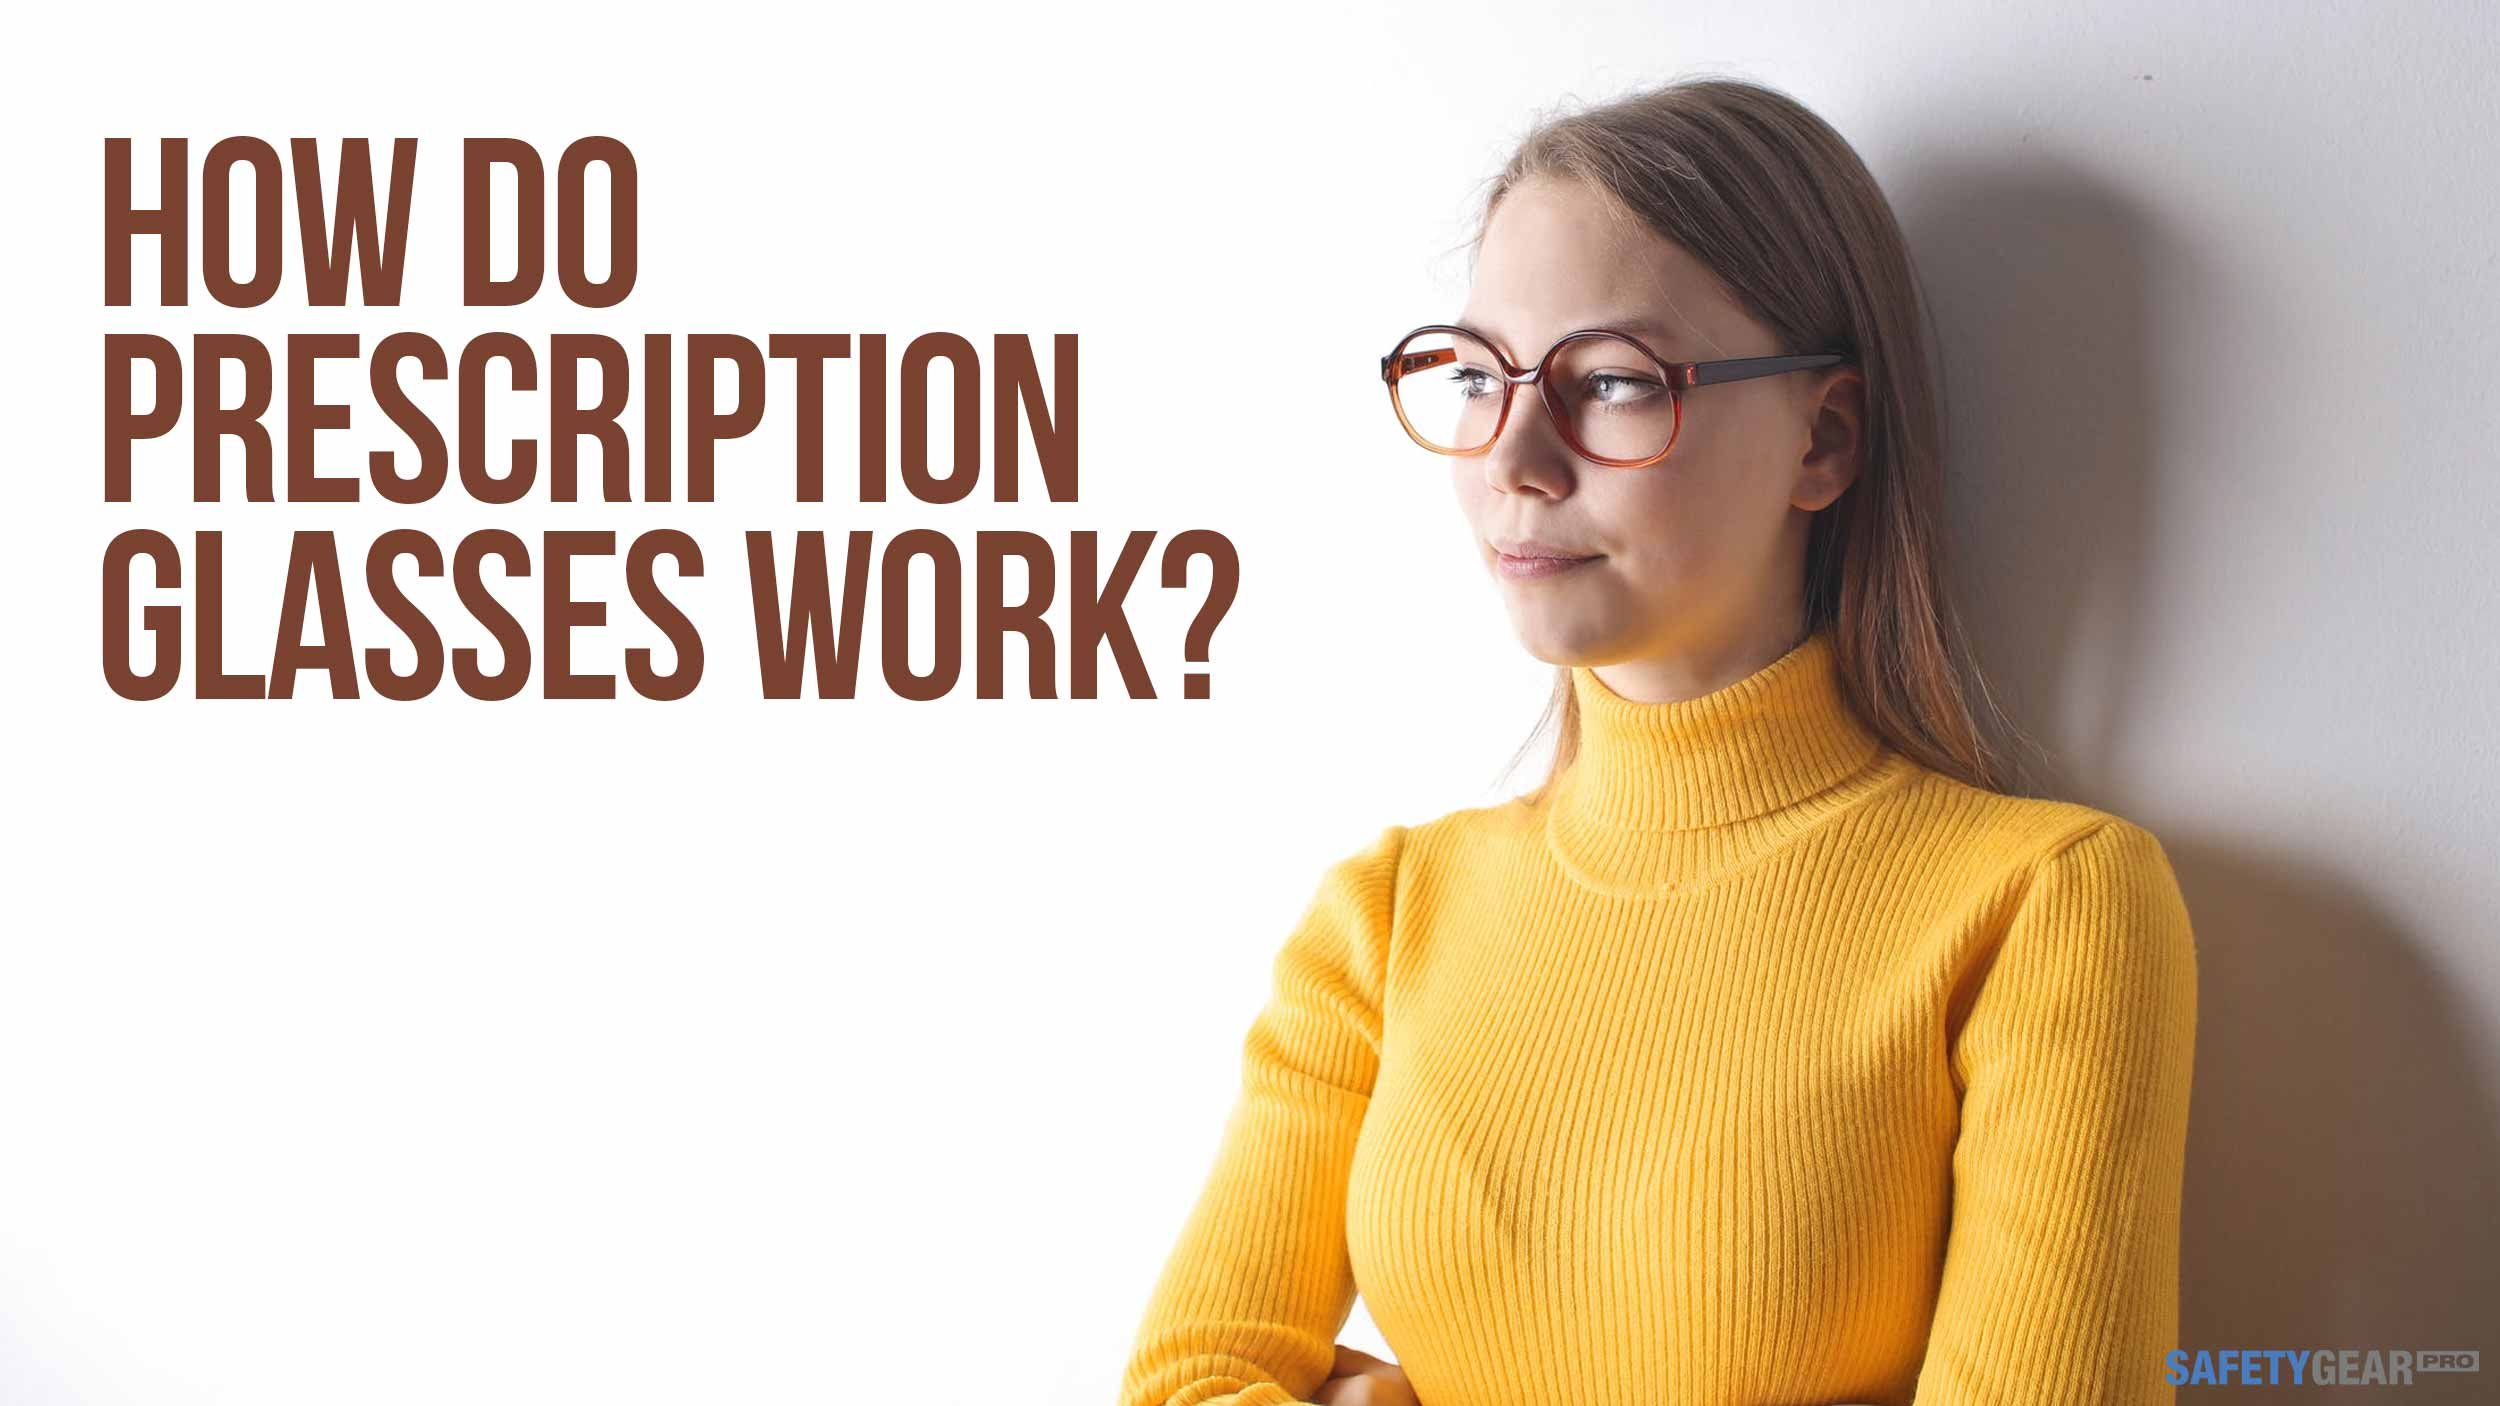 How do prescription glasses work?